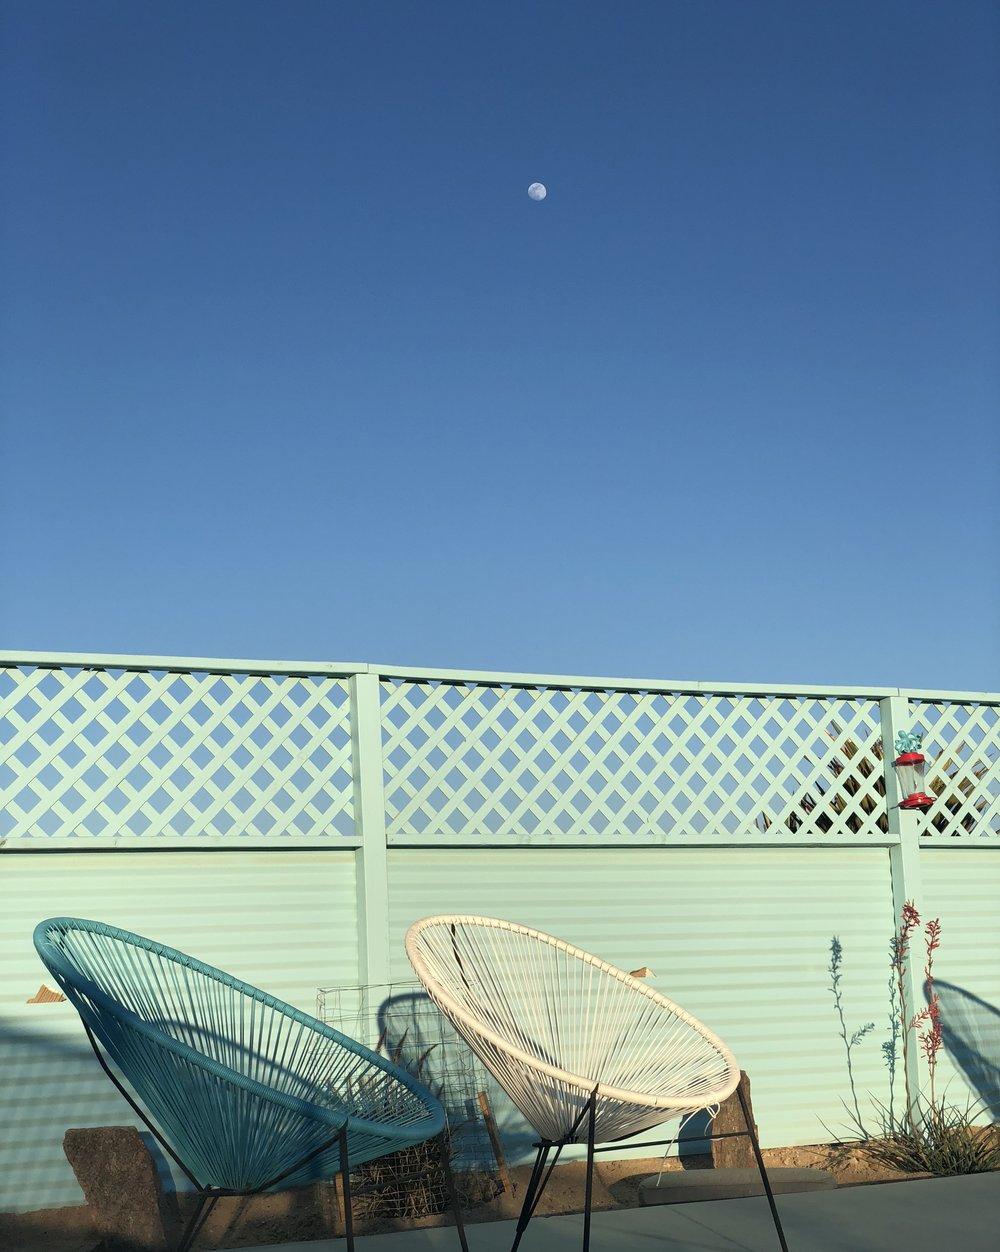 full-moon-may.jpeg